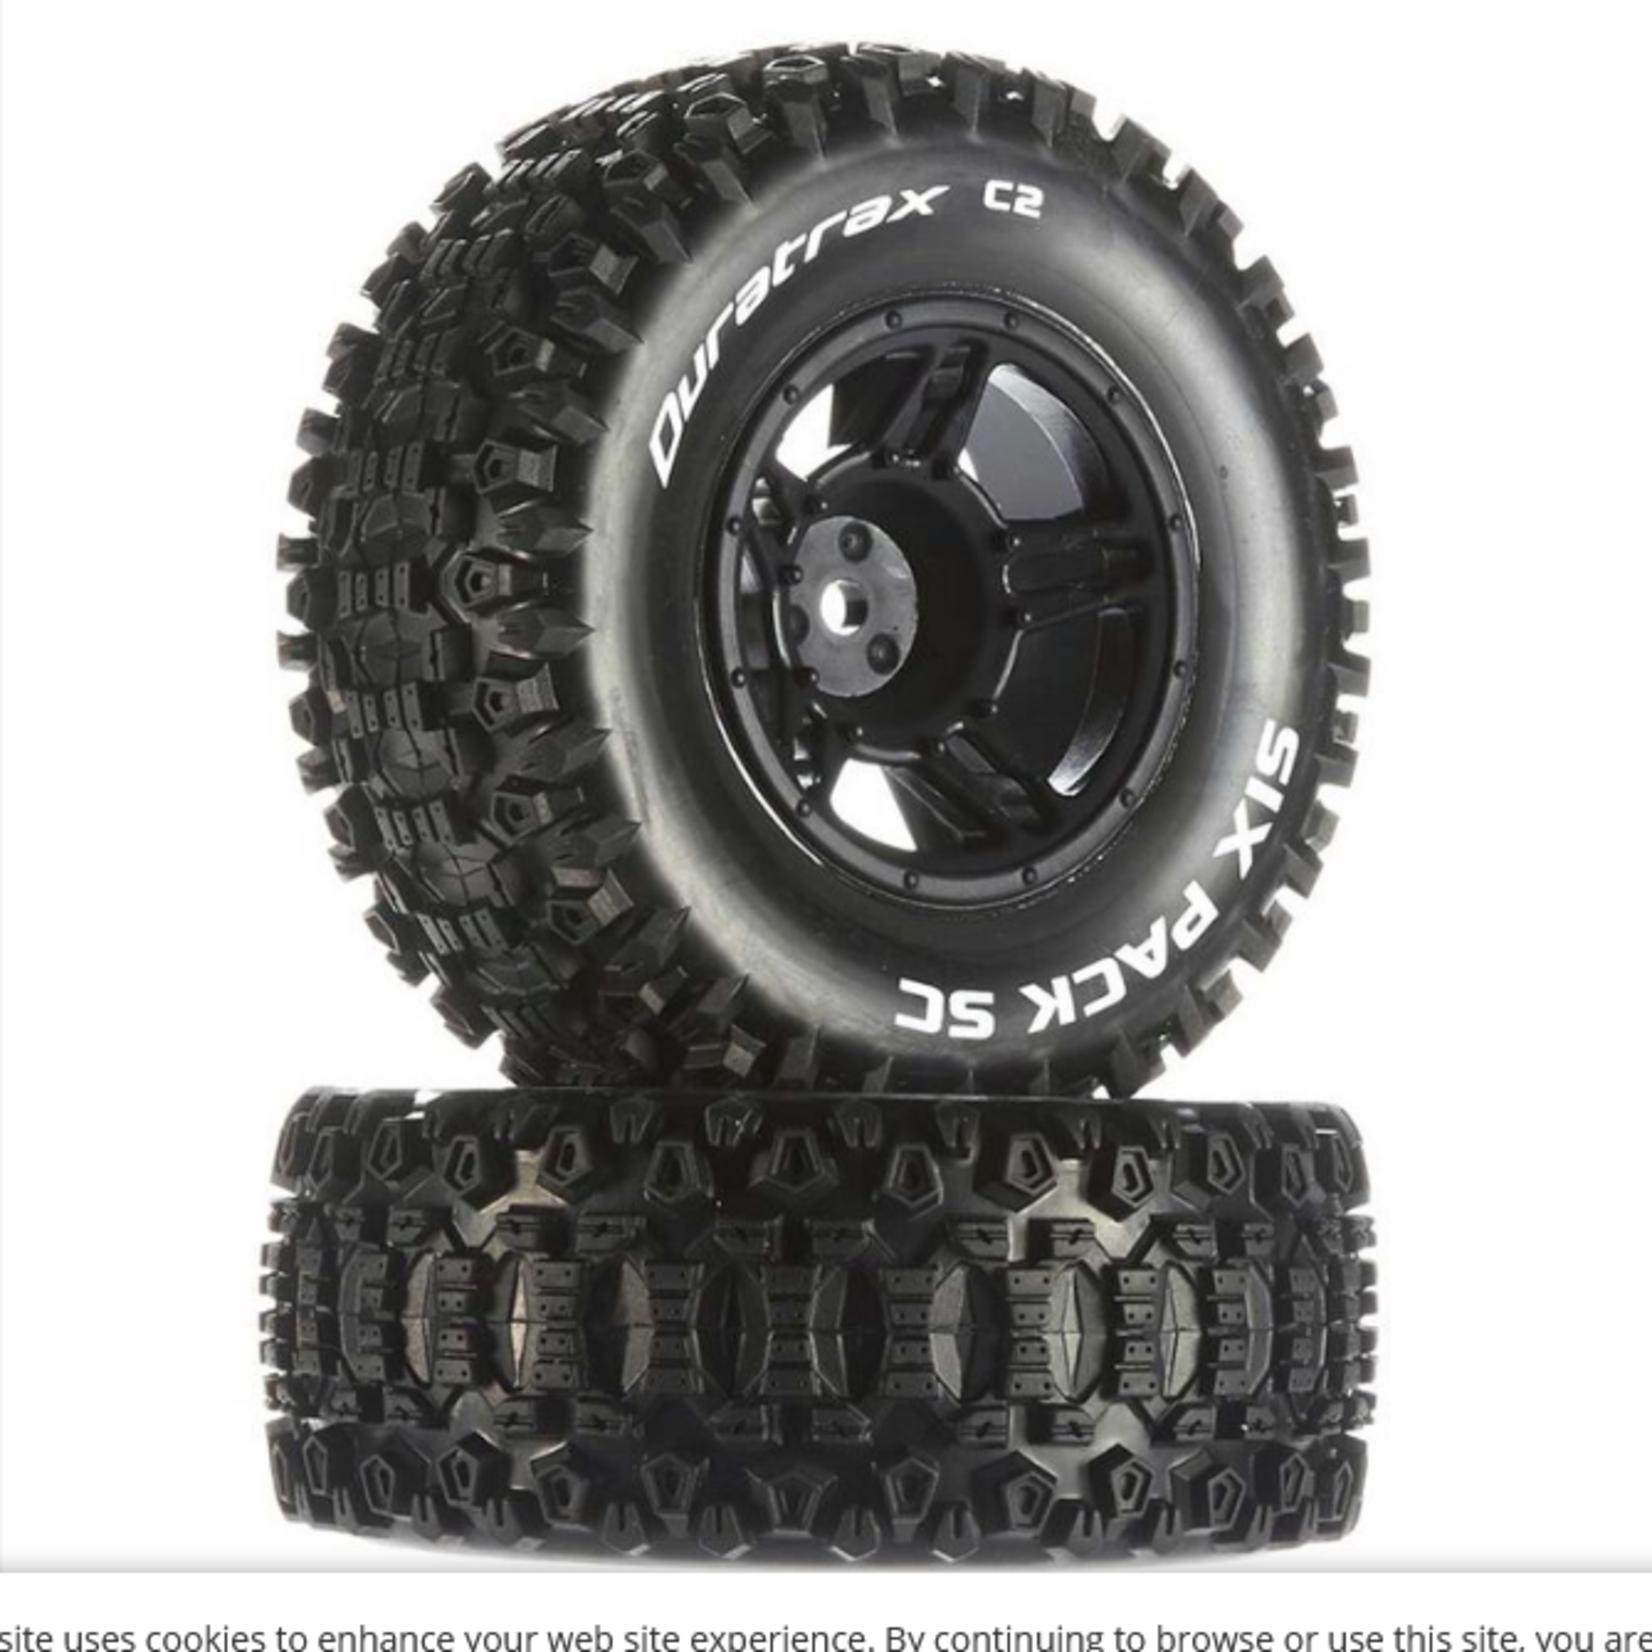 Duratrax DTXC3860 Duratrax Six-Pack SC C2 Mounted Tires: Traxxas Slash Front (2)